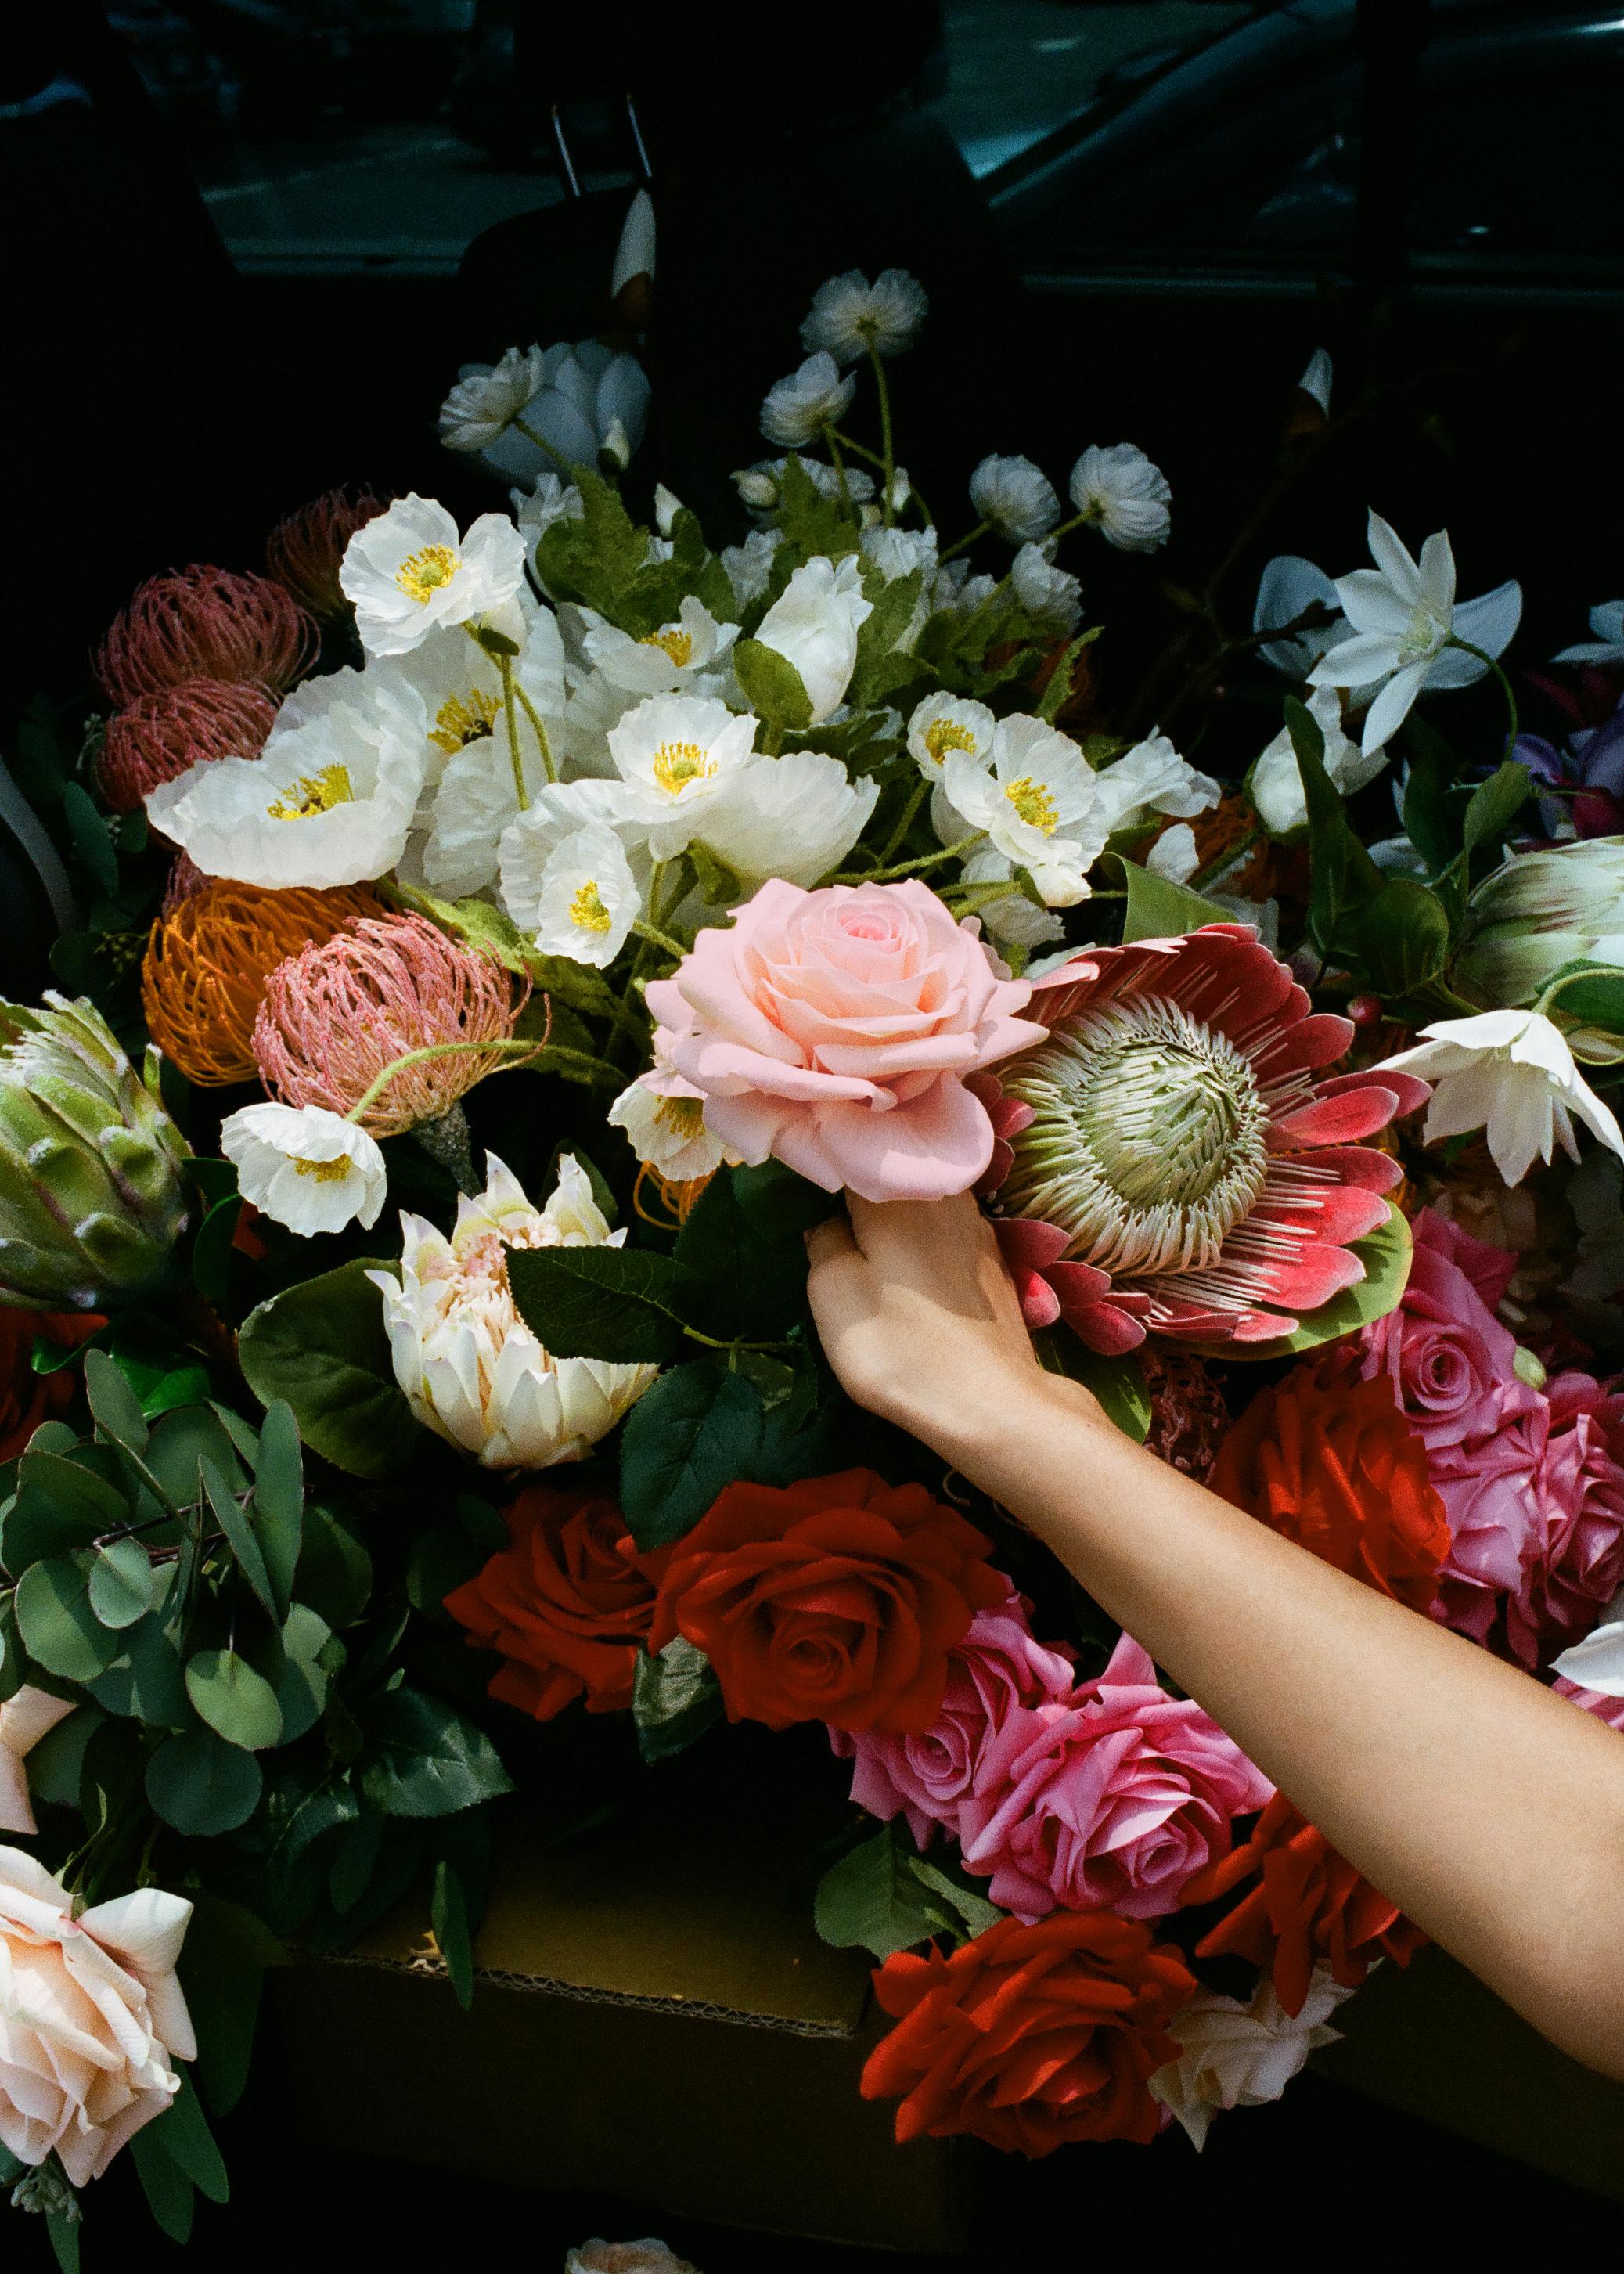 Hand-rose-5x7.jpg